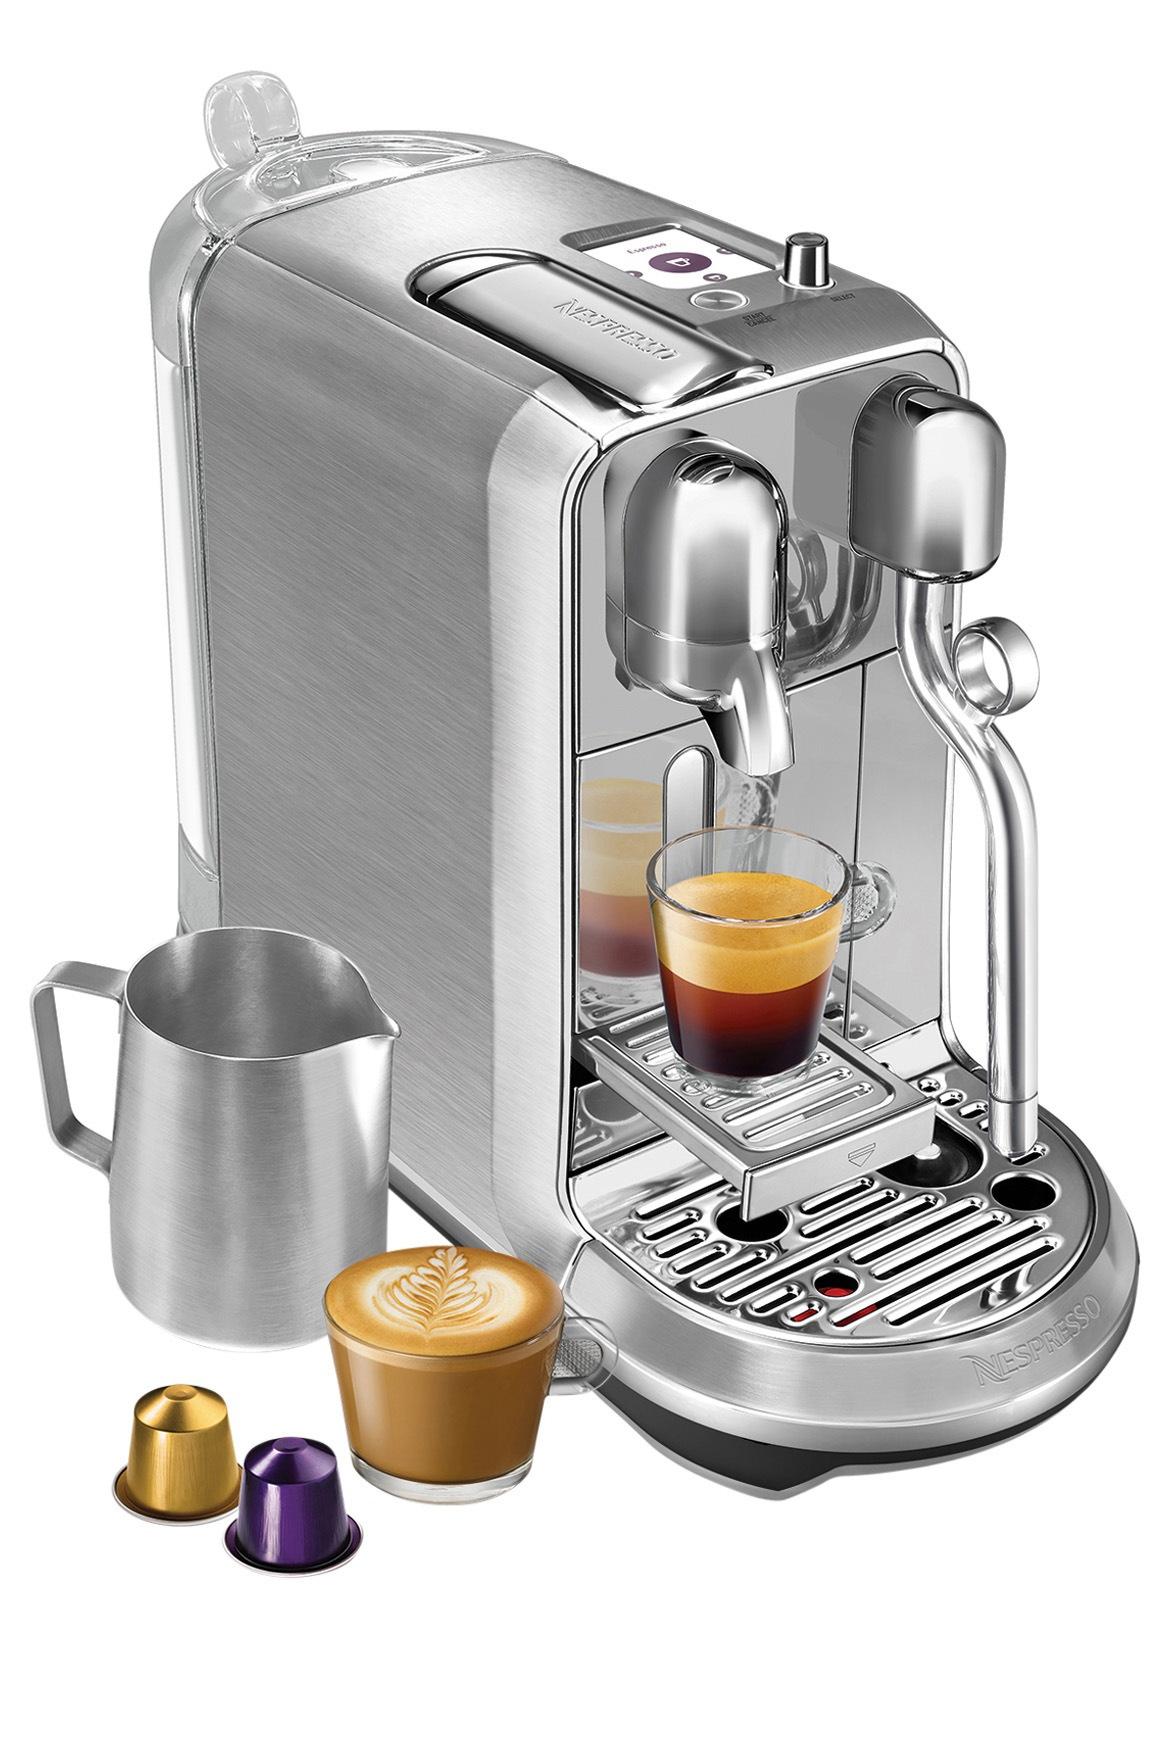 Uncategorized Myer Kitchen Appliances nespresso by breville creatista plus capsule coffee machine myer online categoryname